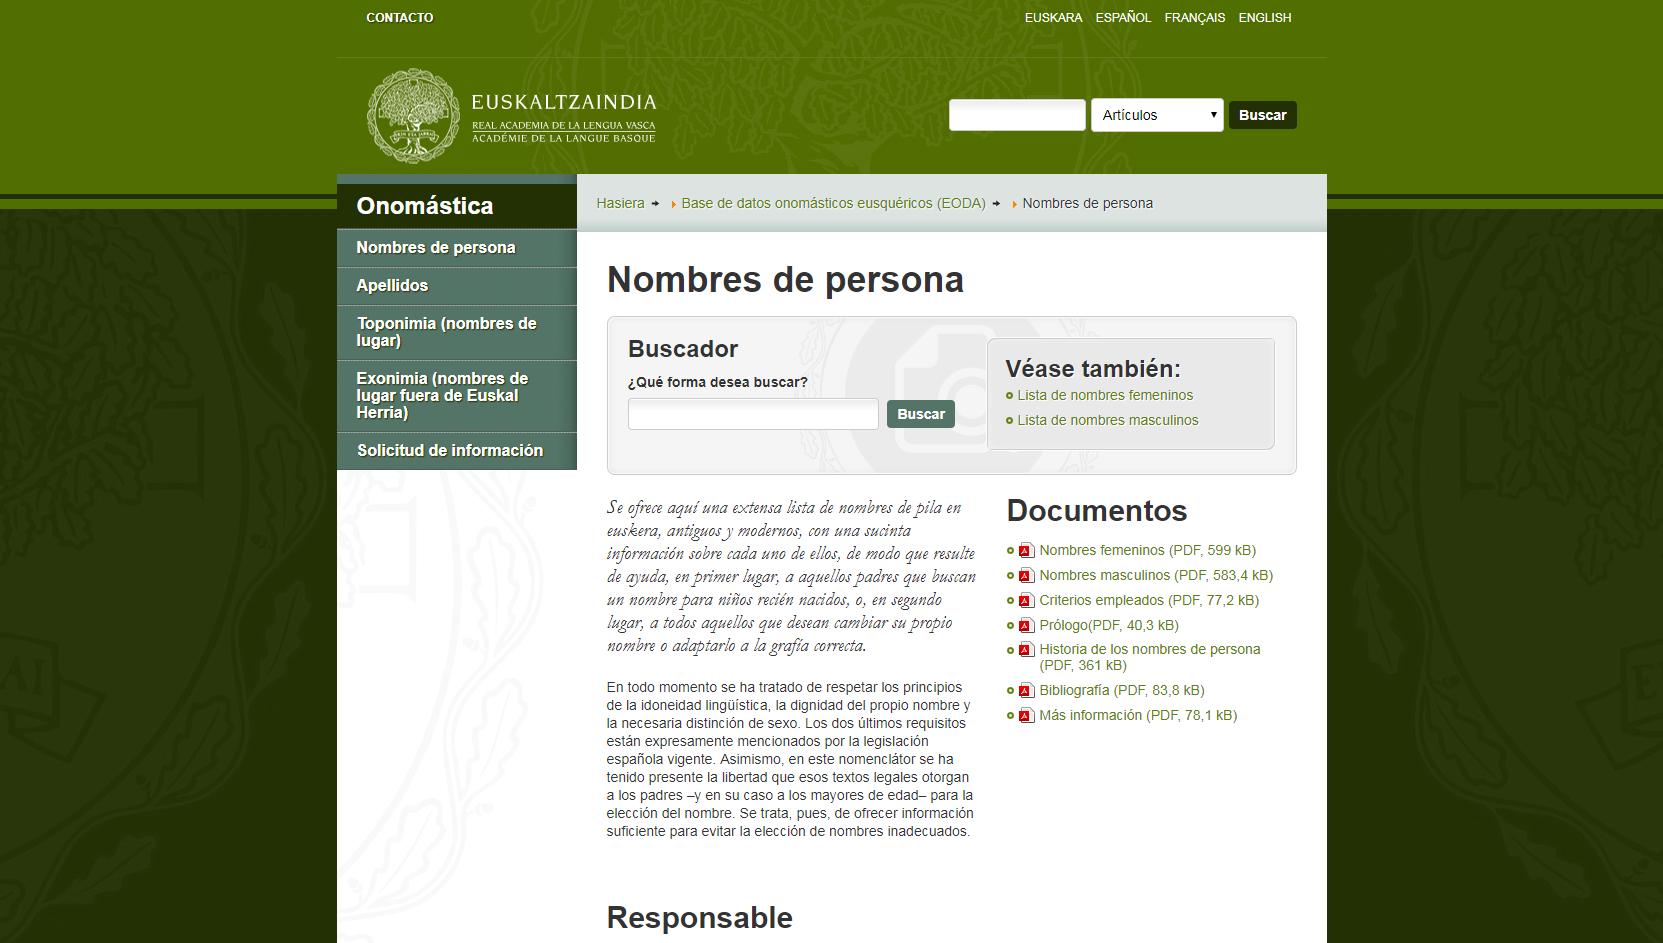 Nombres de personas en euskera (Fuente: http://www.euskaltzaindia.eus/index.php?option=com_content&view=article&id=4161&Itemid=699&lang=es)